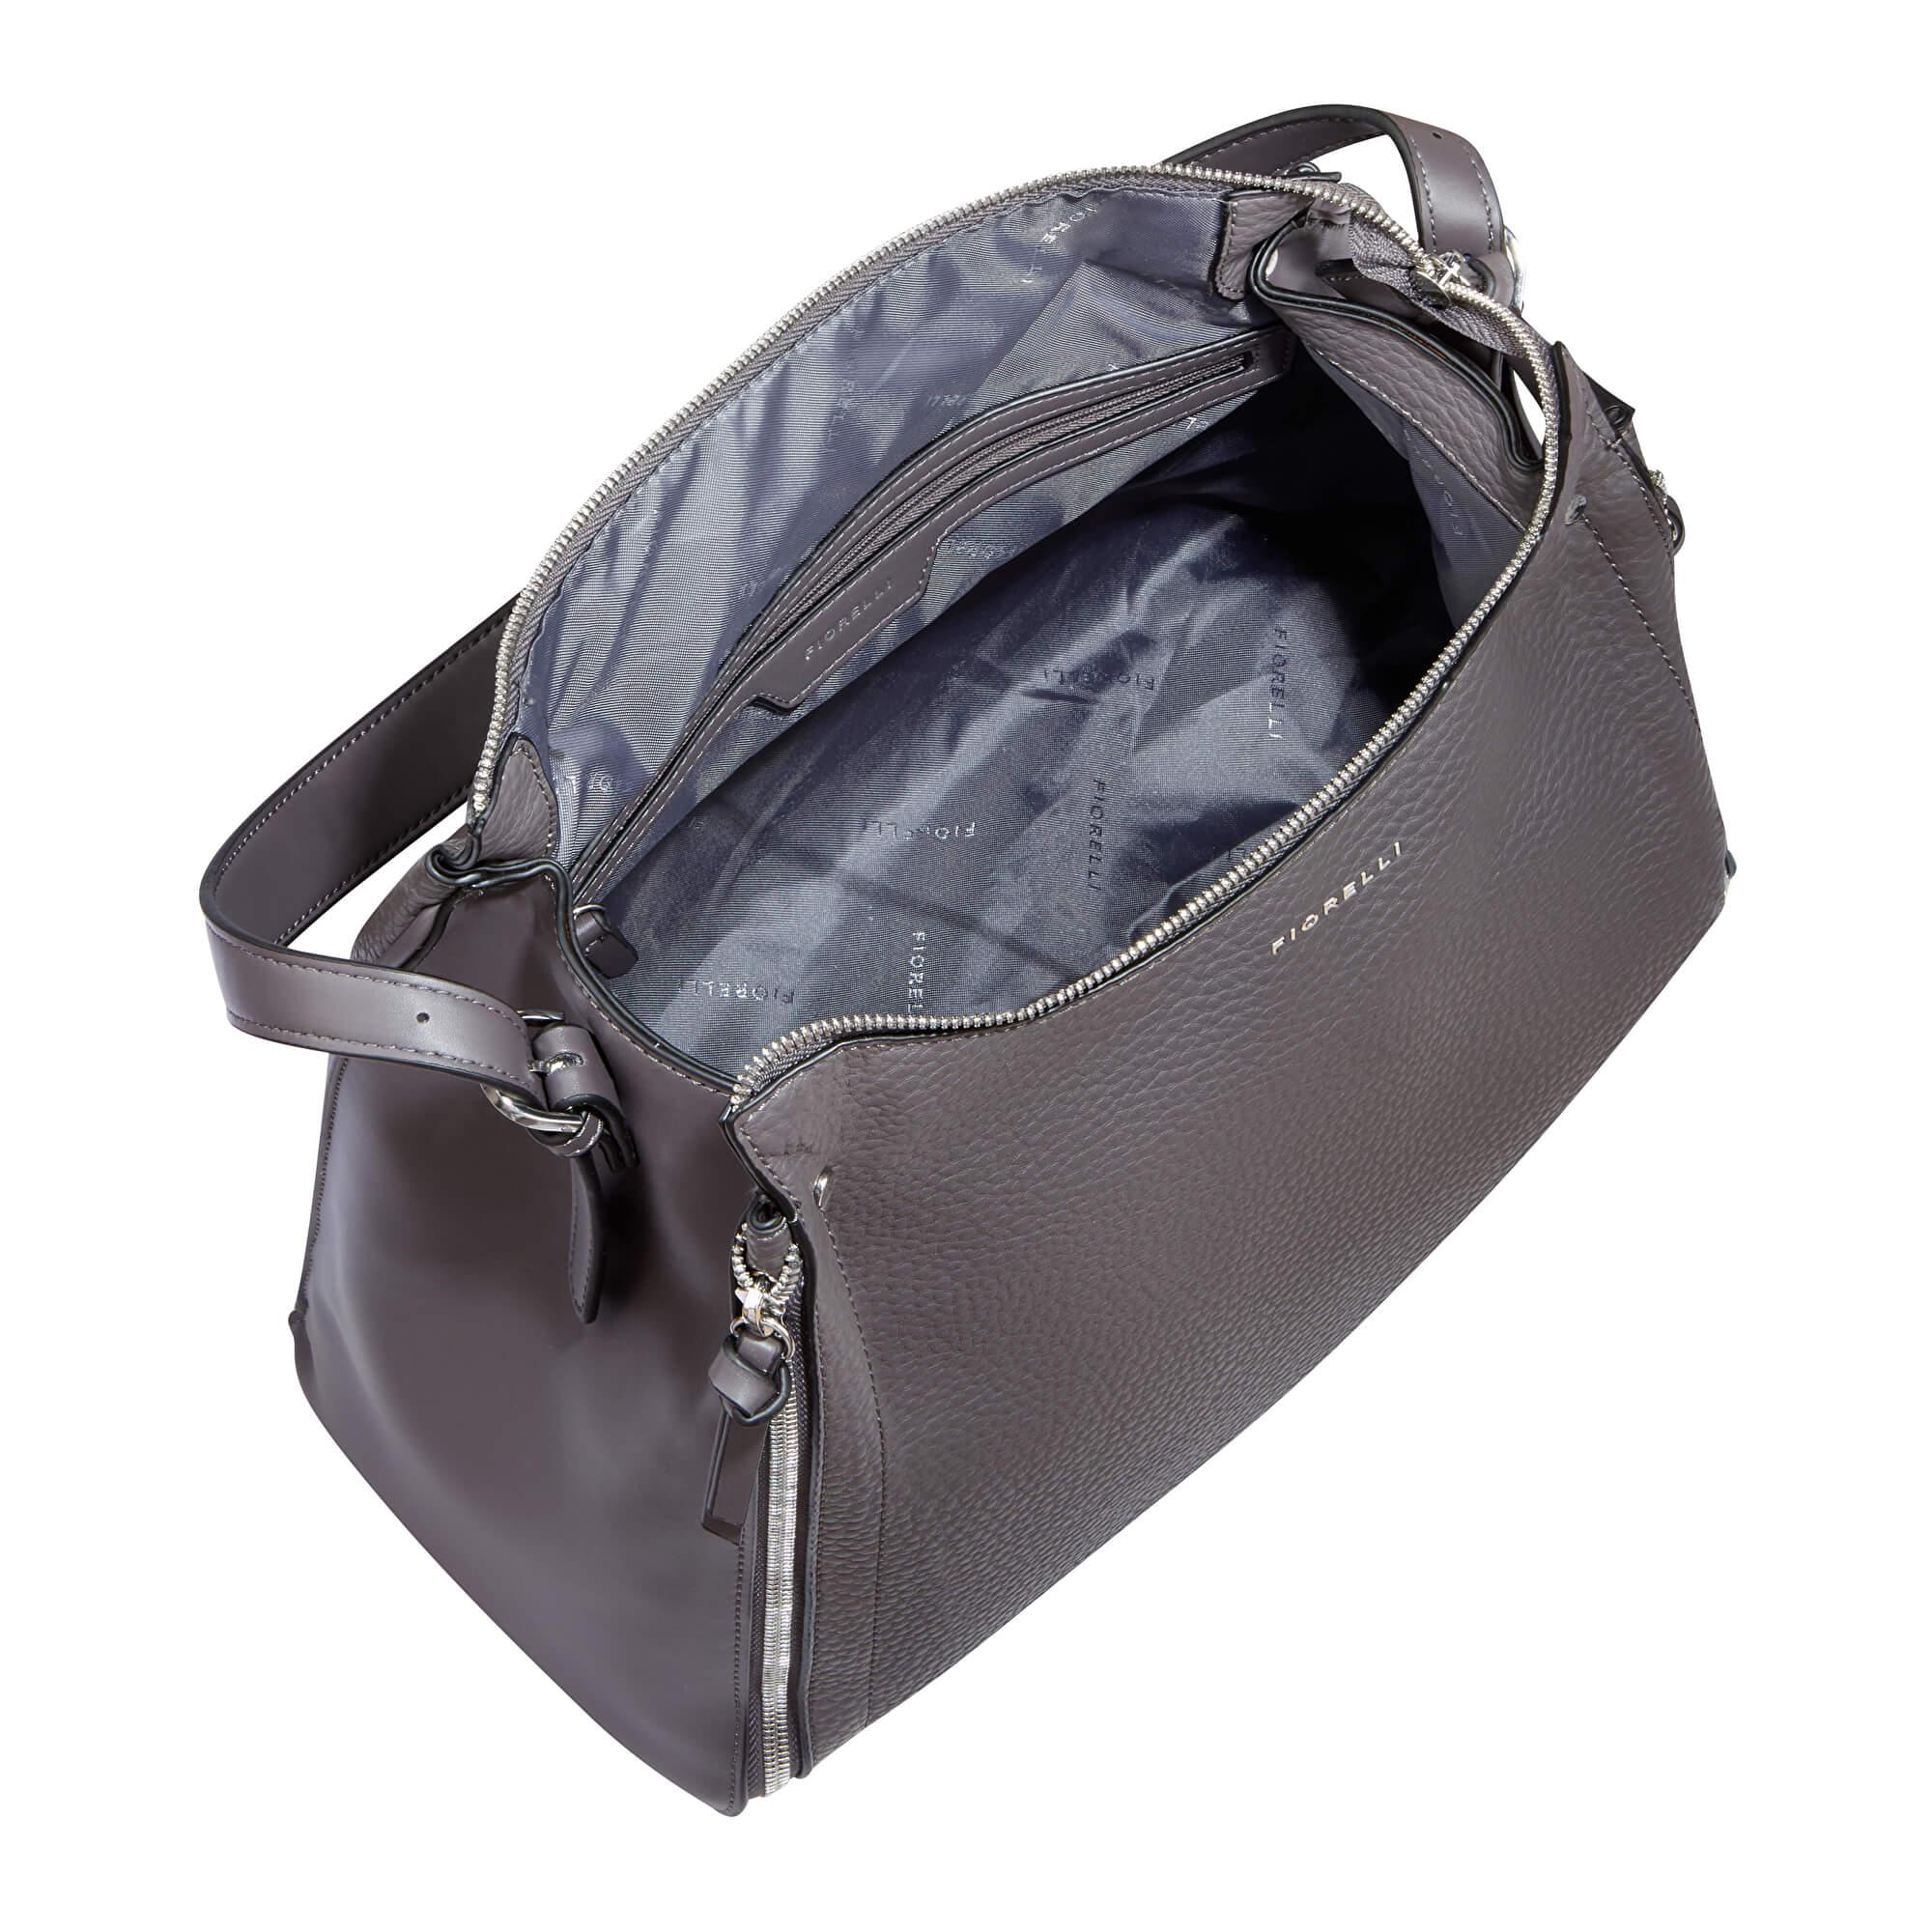 Fiorelli Elegantní kabelka Fleur FWH0247 Cobble Grey Doprava ZDARMA ... afbba067cea